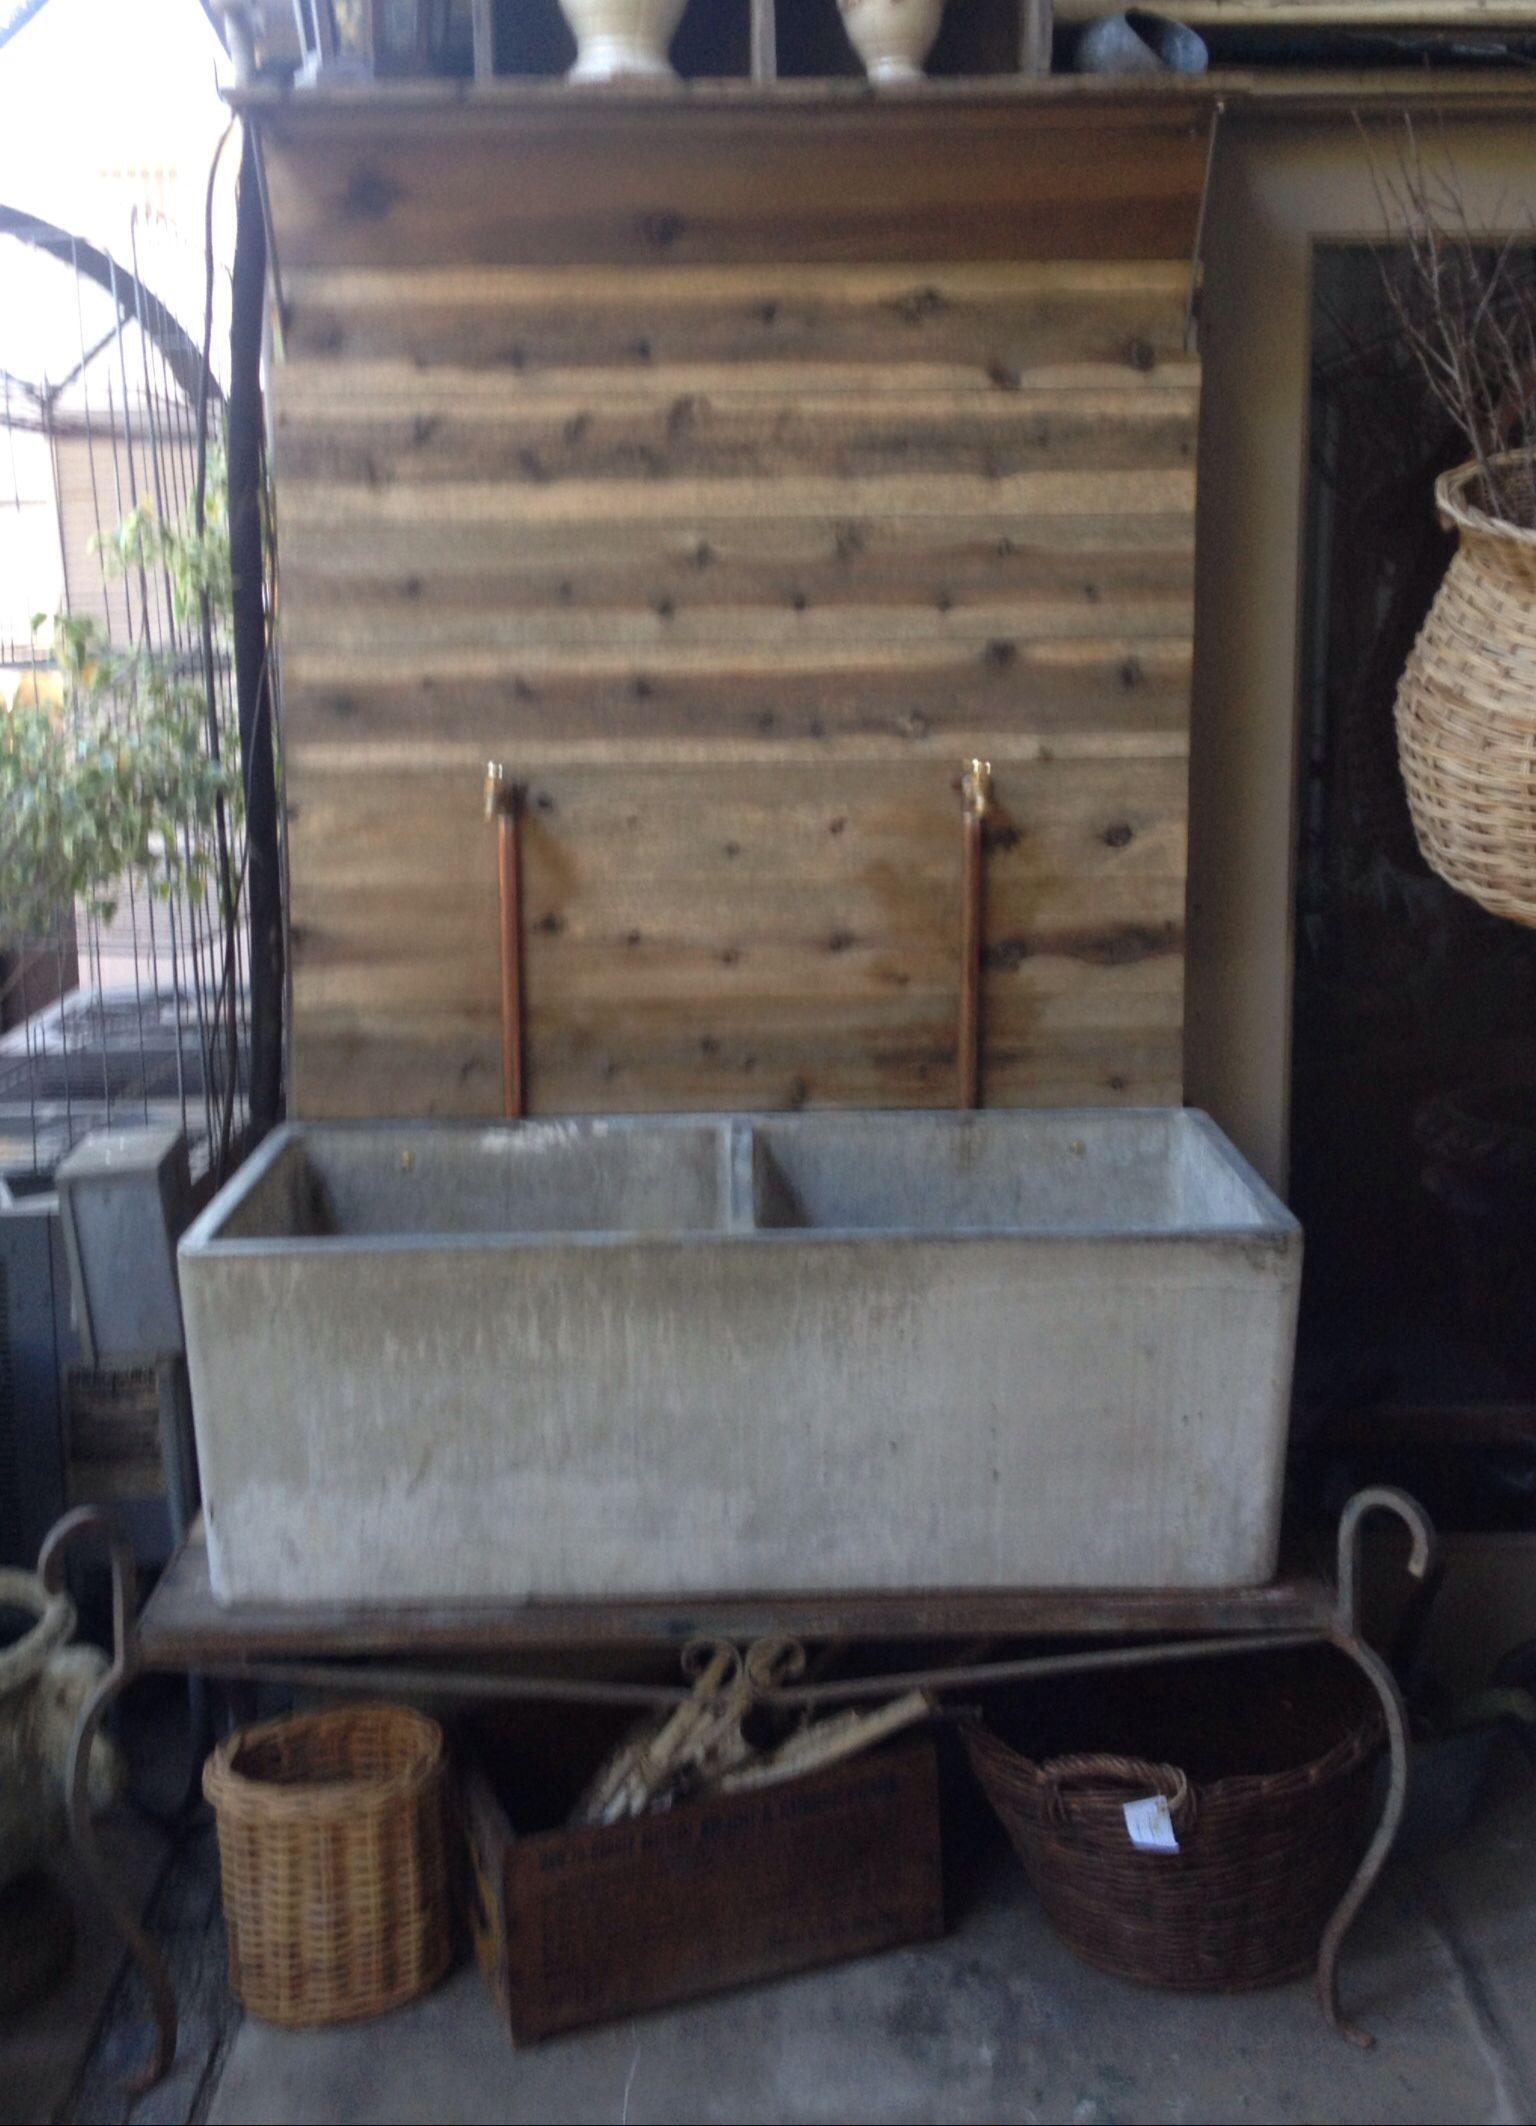 Cement Garden Sink With Spigot Faucets In 2019 Garden